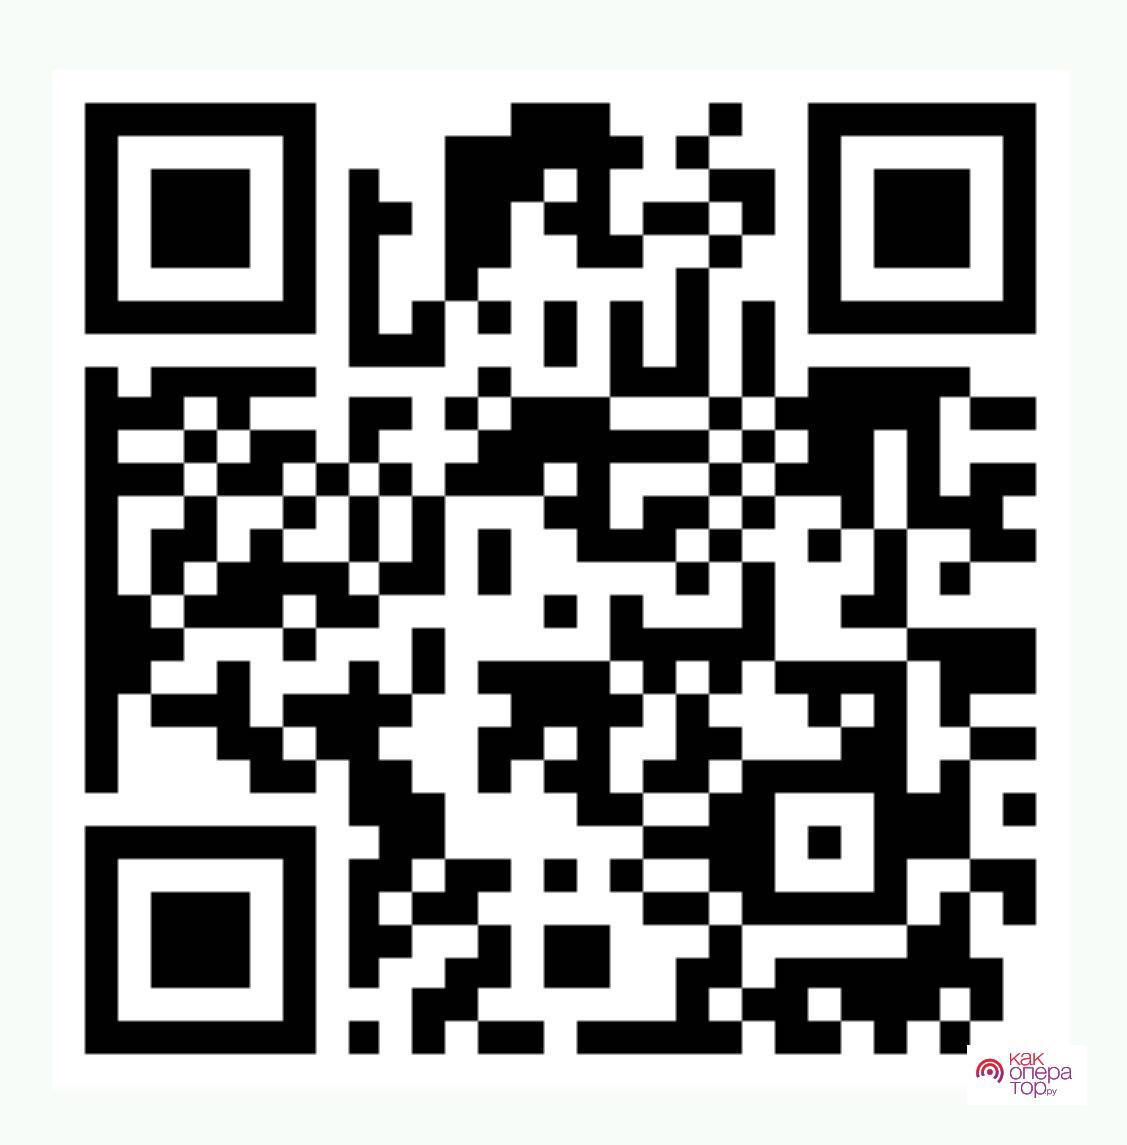 https://sun9-8.userapi.com/impg/A6sGflTHkyFjNQyqMO16xCQ6oe0yj68uobSIPQ/qFvalAXvubw.jpg?size=1127x1145&quality=96&sign=8120b876bcdc2701c8b004136b0333a5&type=album